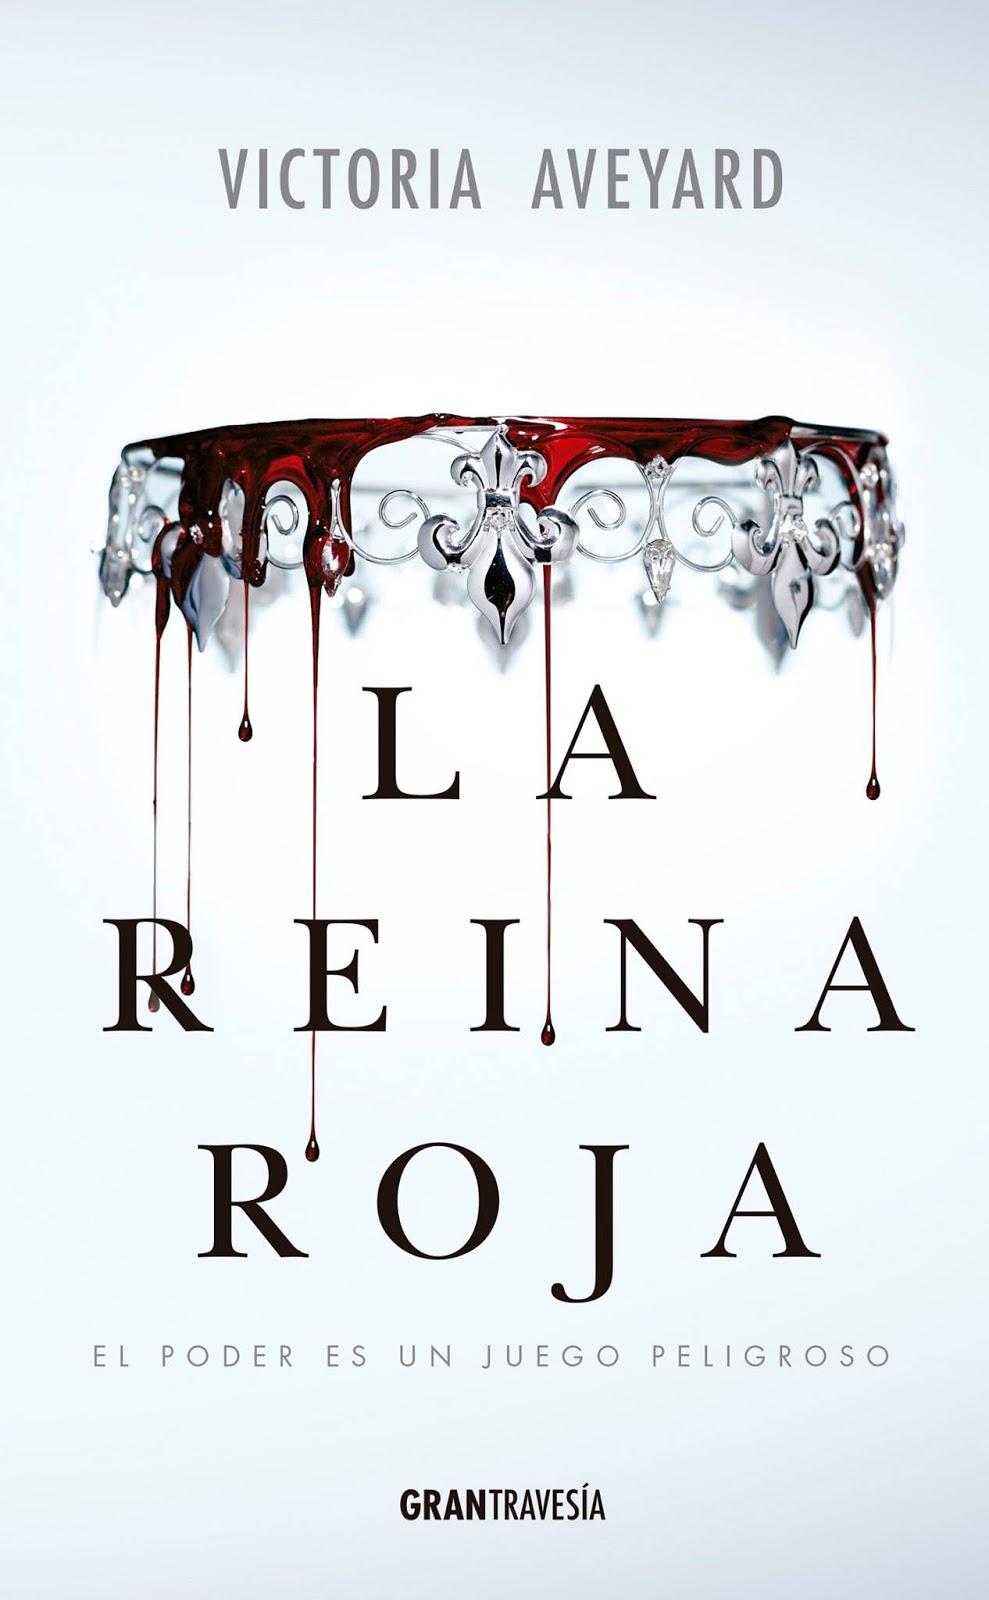 http://labibliotecadebella.blogspot.com.es/2016/01/la-reina-roja-victoria-aveyard.html